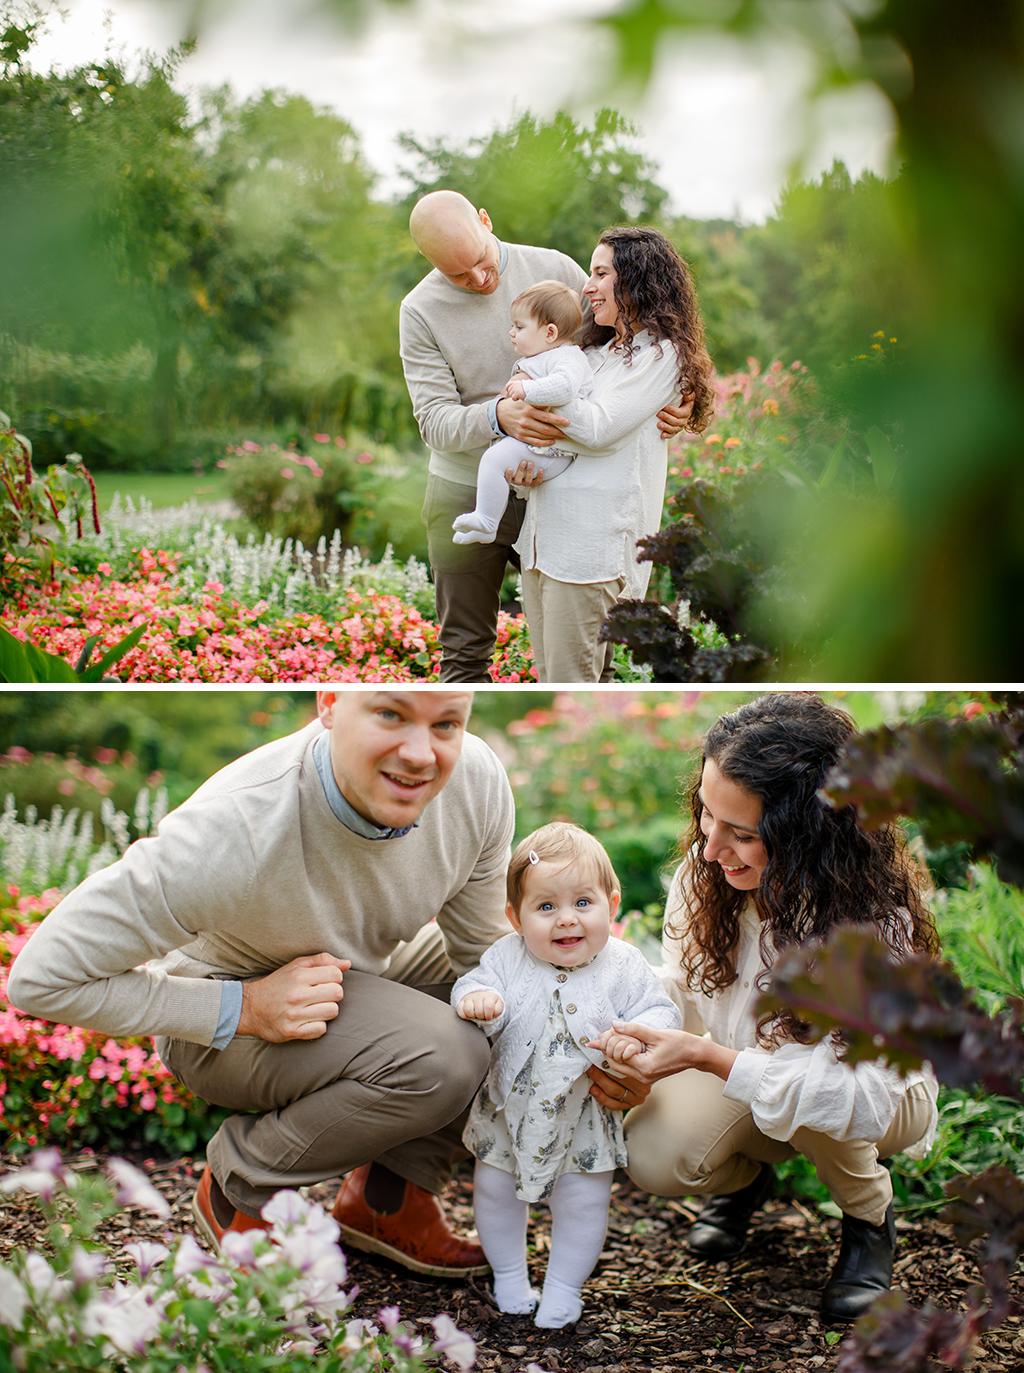 Lifestyle-familjefotografering_Anna_Sandstrom.jpg